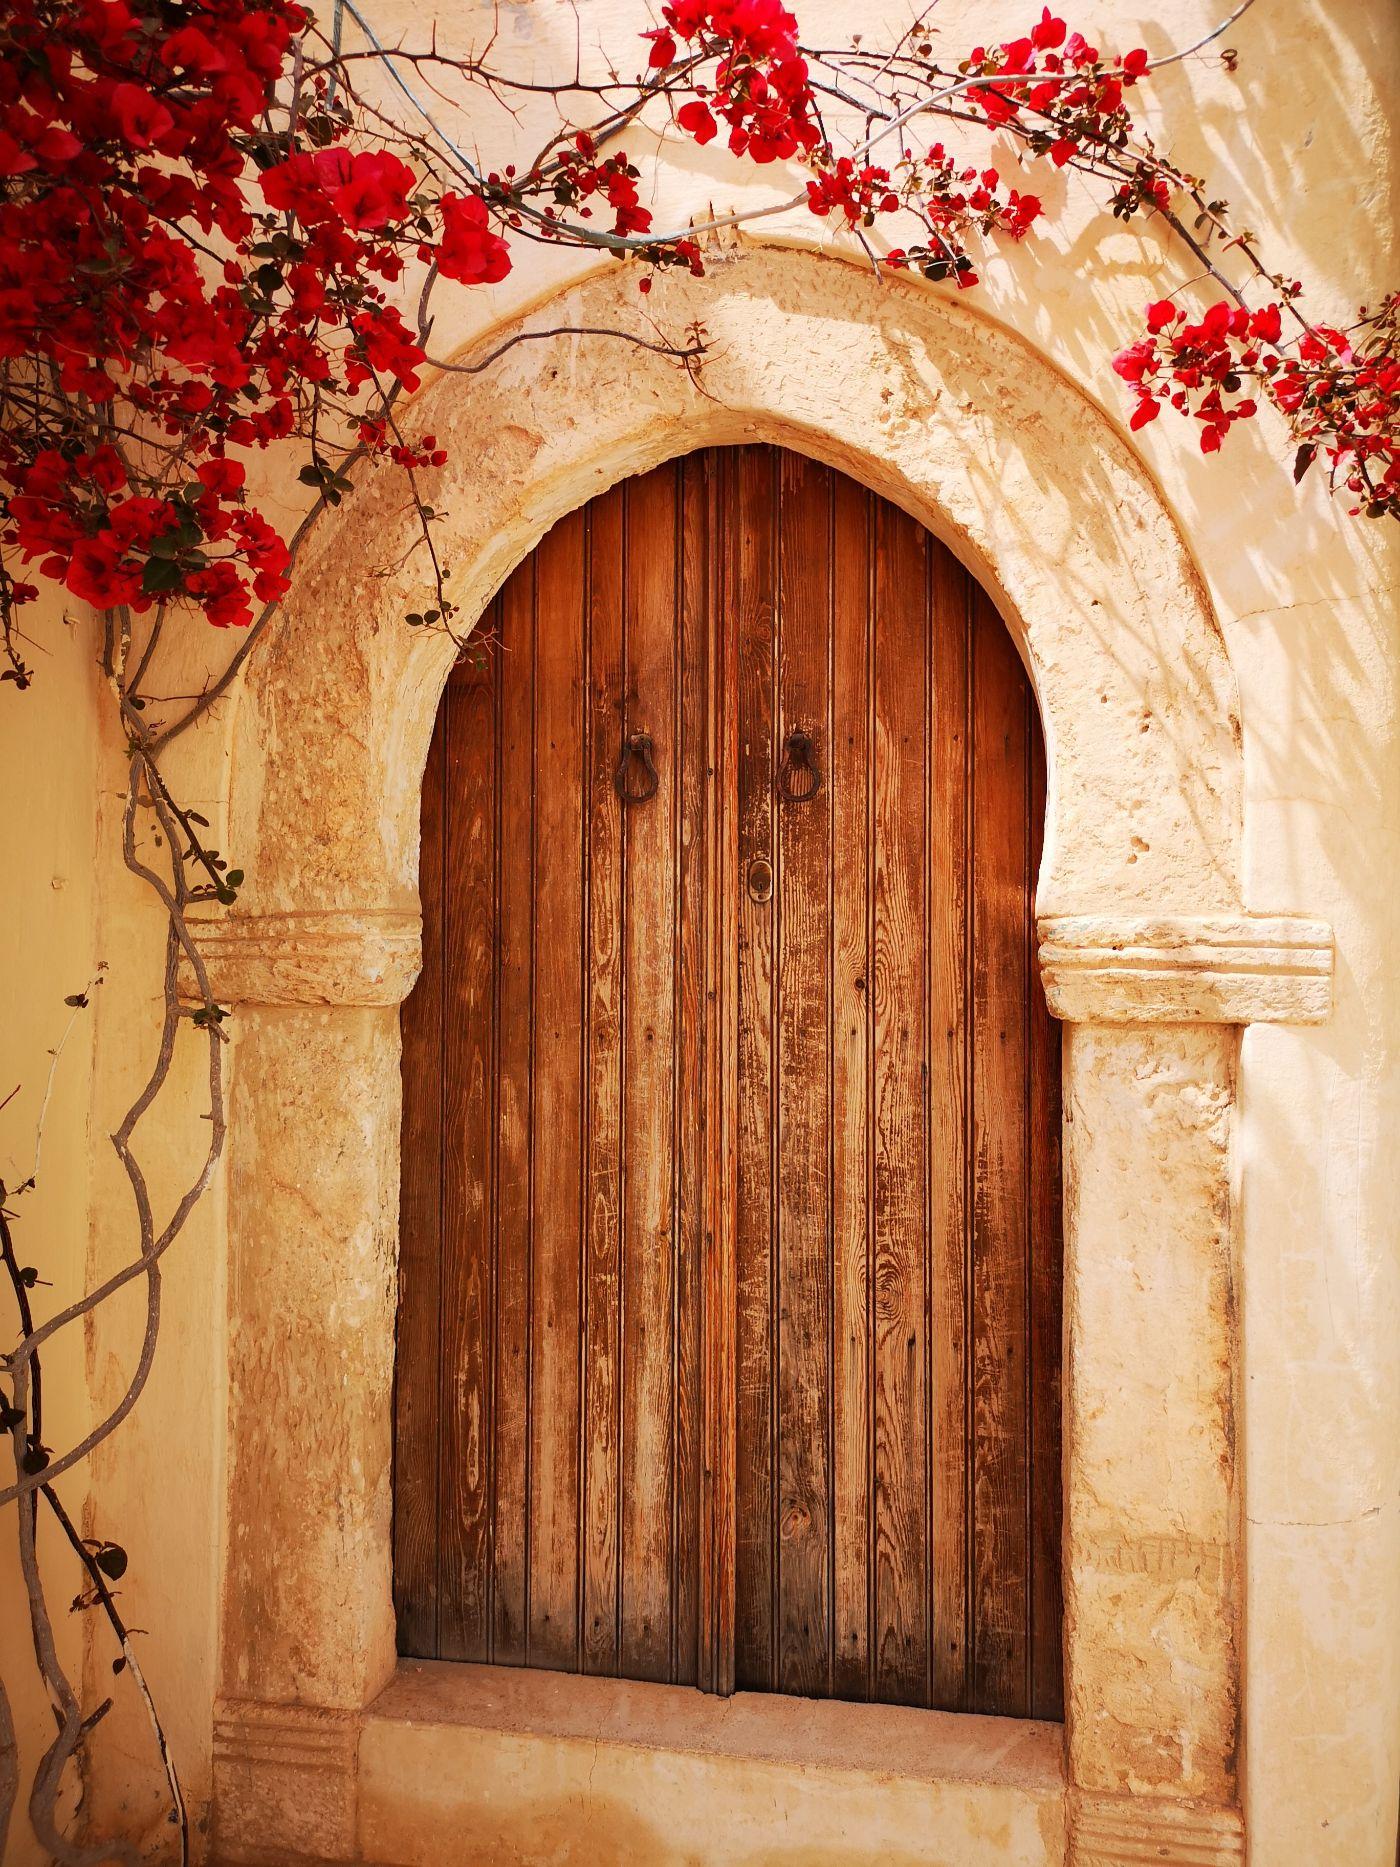 Djerbahood drzwi djerba tunezja 5